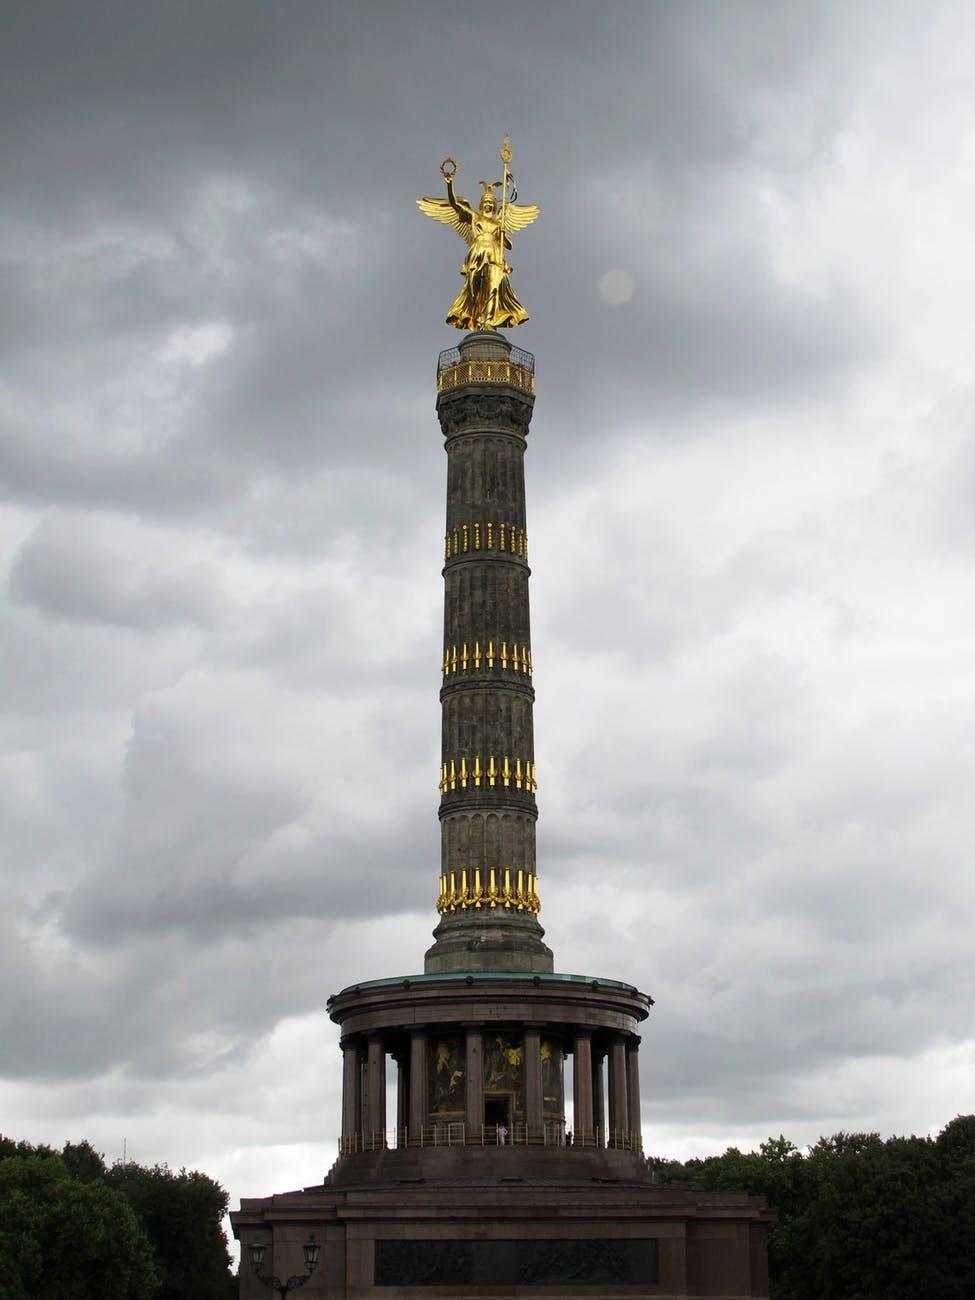 siegessaule-berlin-landmark-sky-64726.jpeg